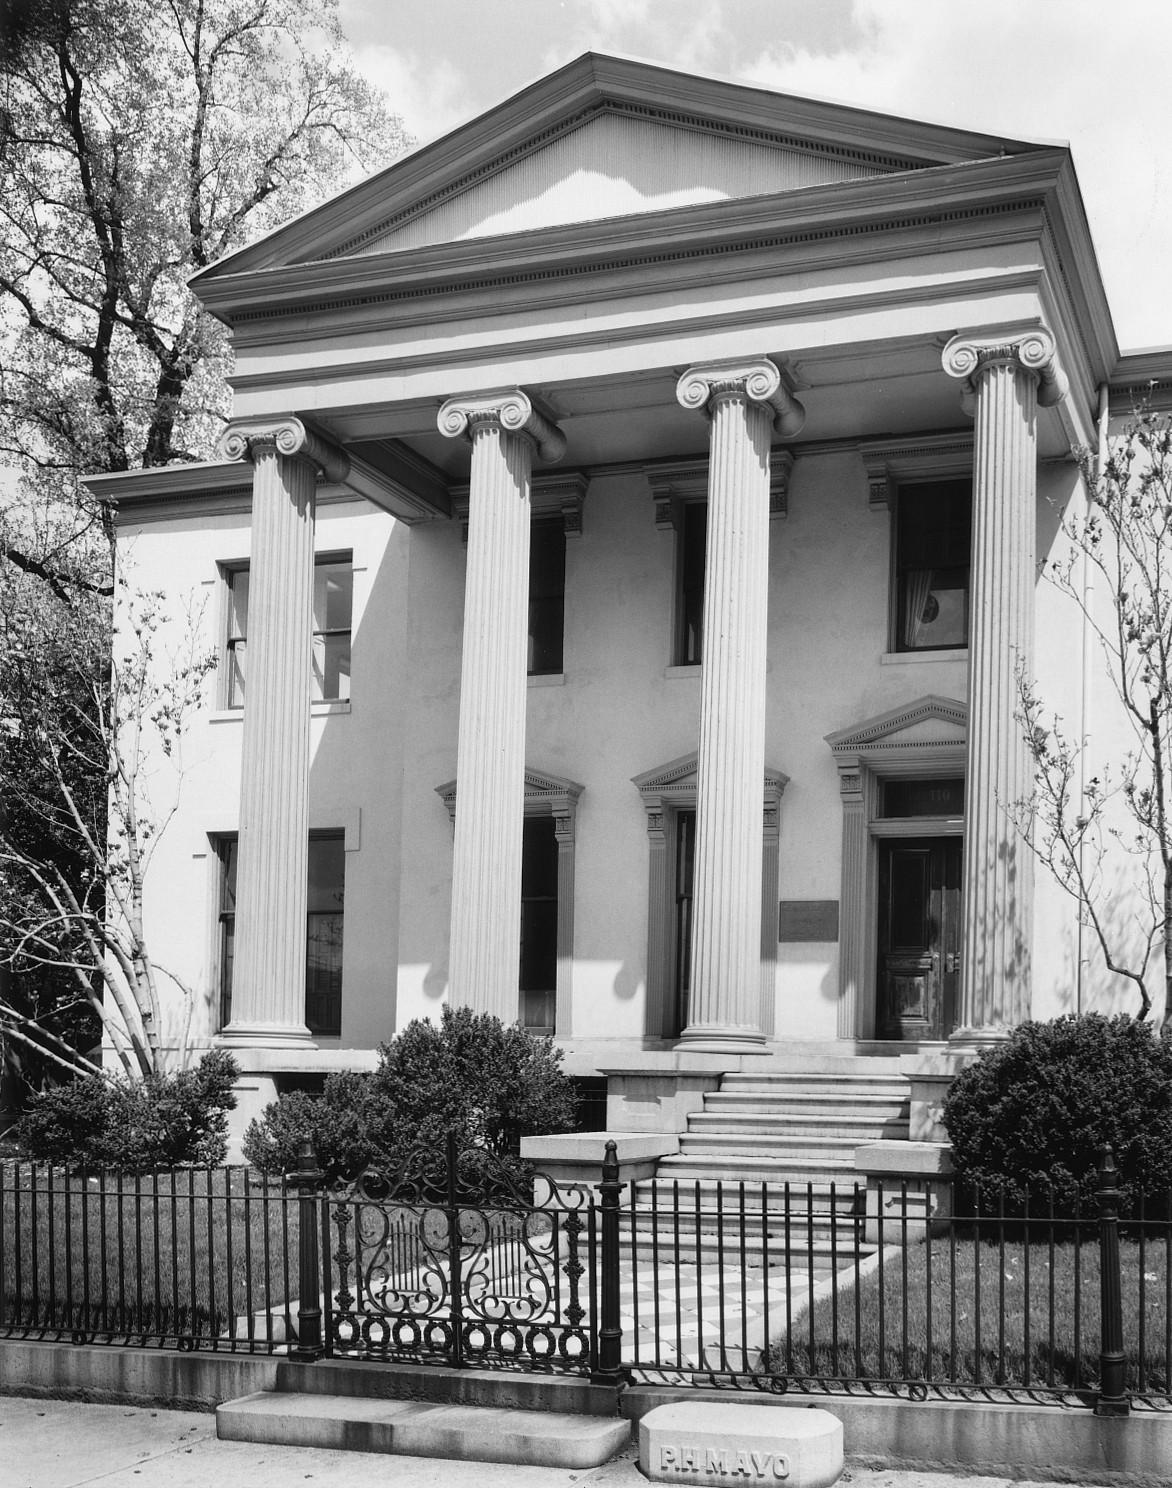 Mayo House (Mayo Memorial Church House)